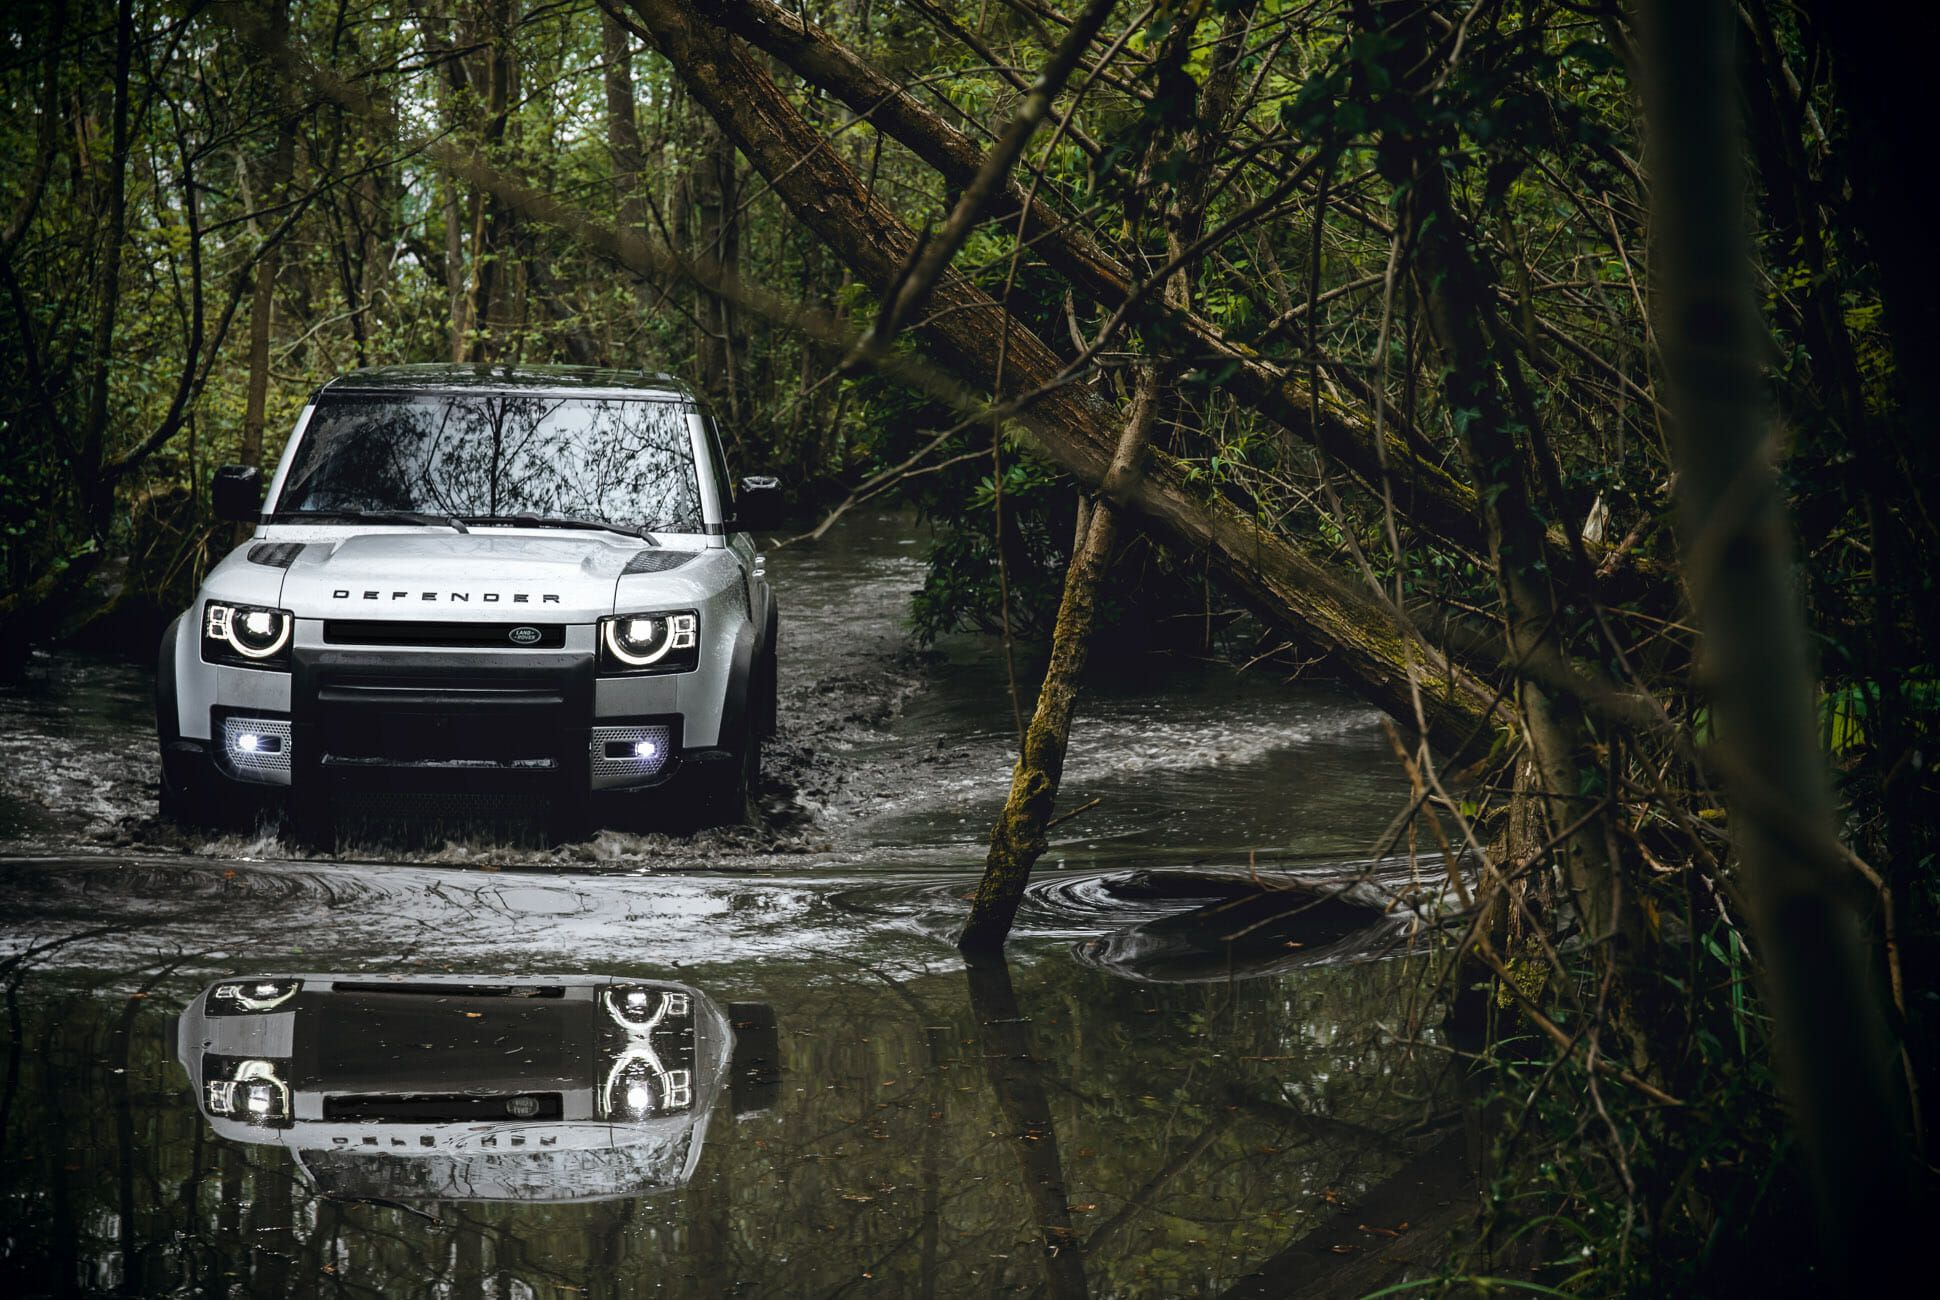 Land Rover Defender Gear Patrol-Exterior Action-Slide-28